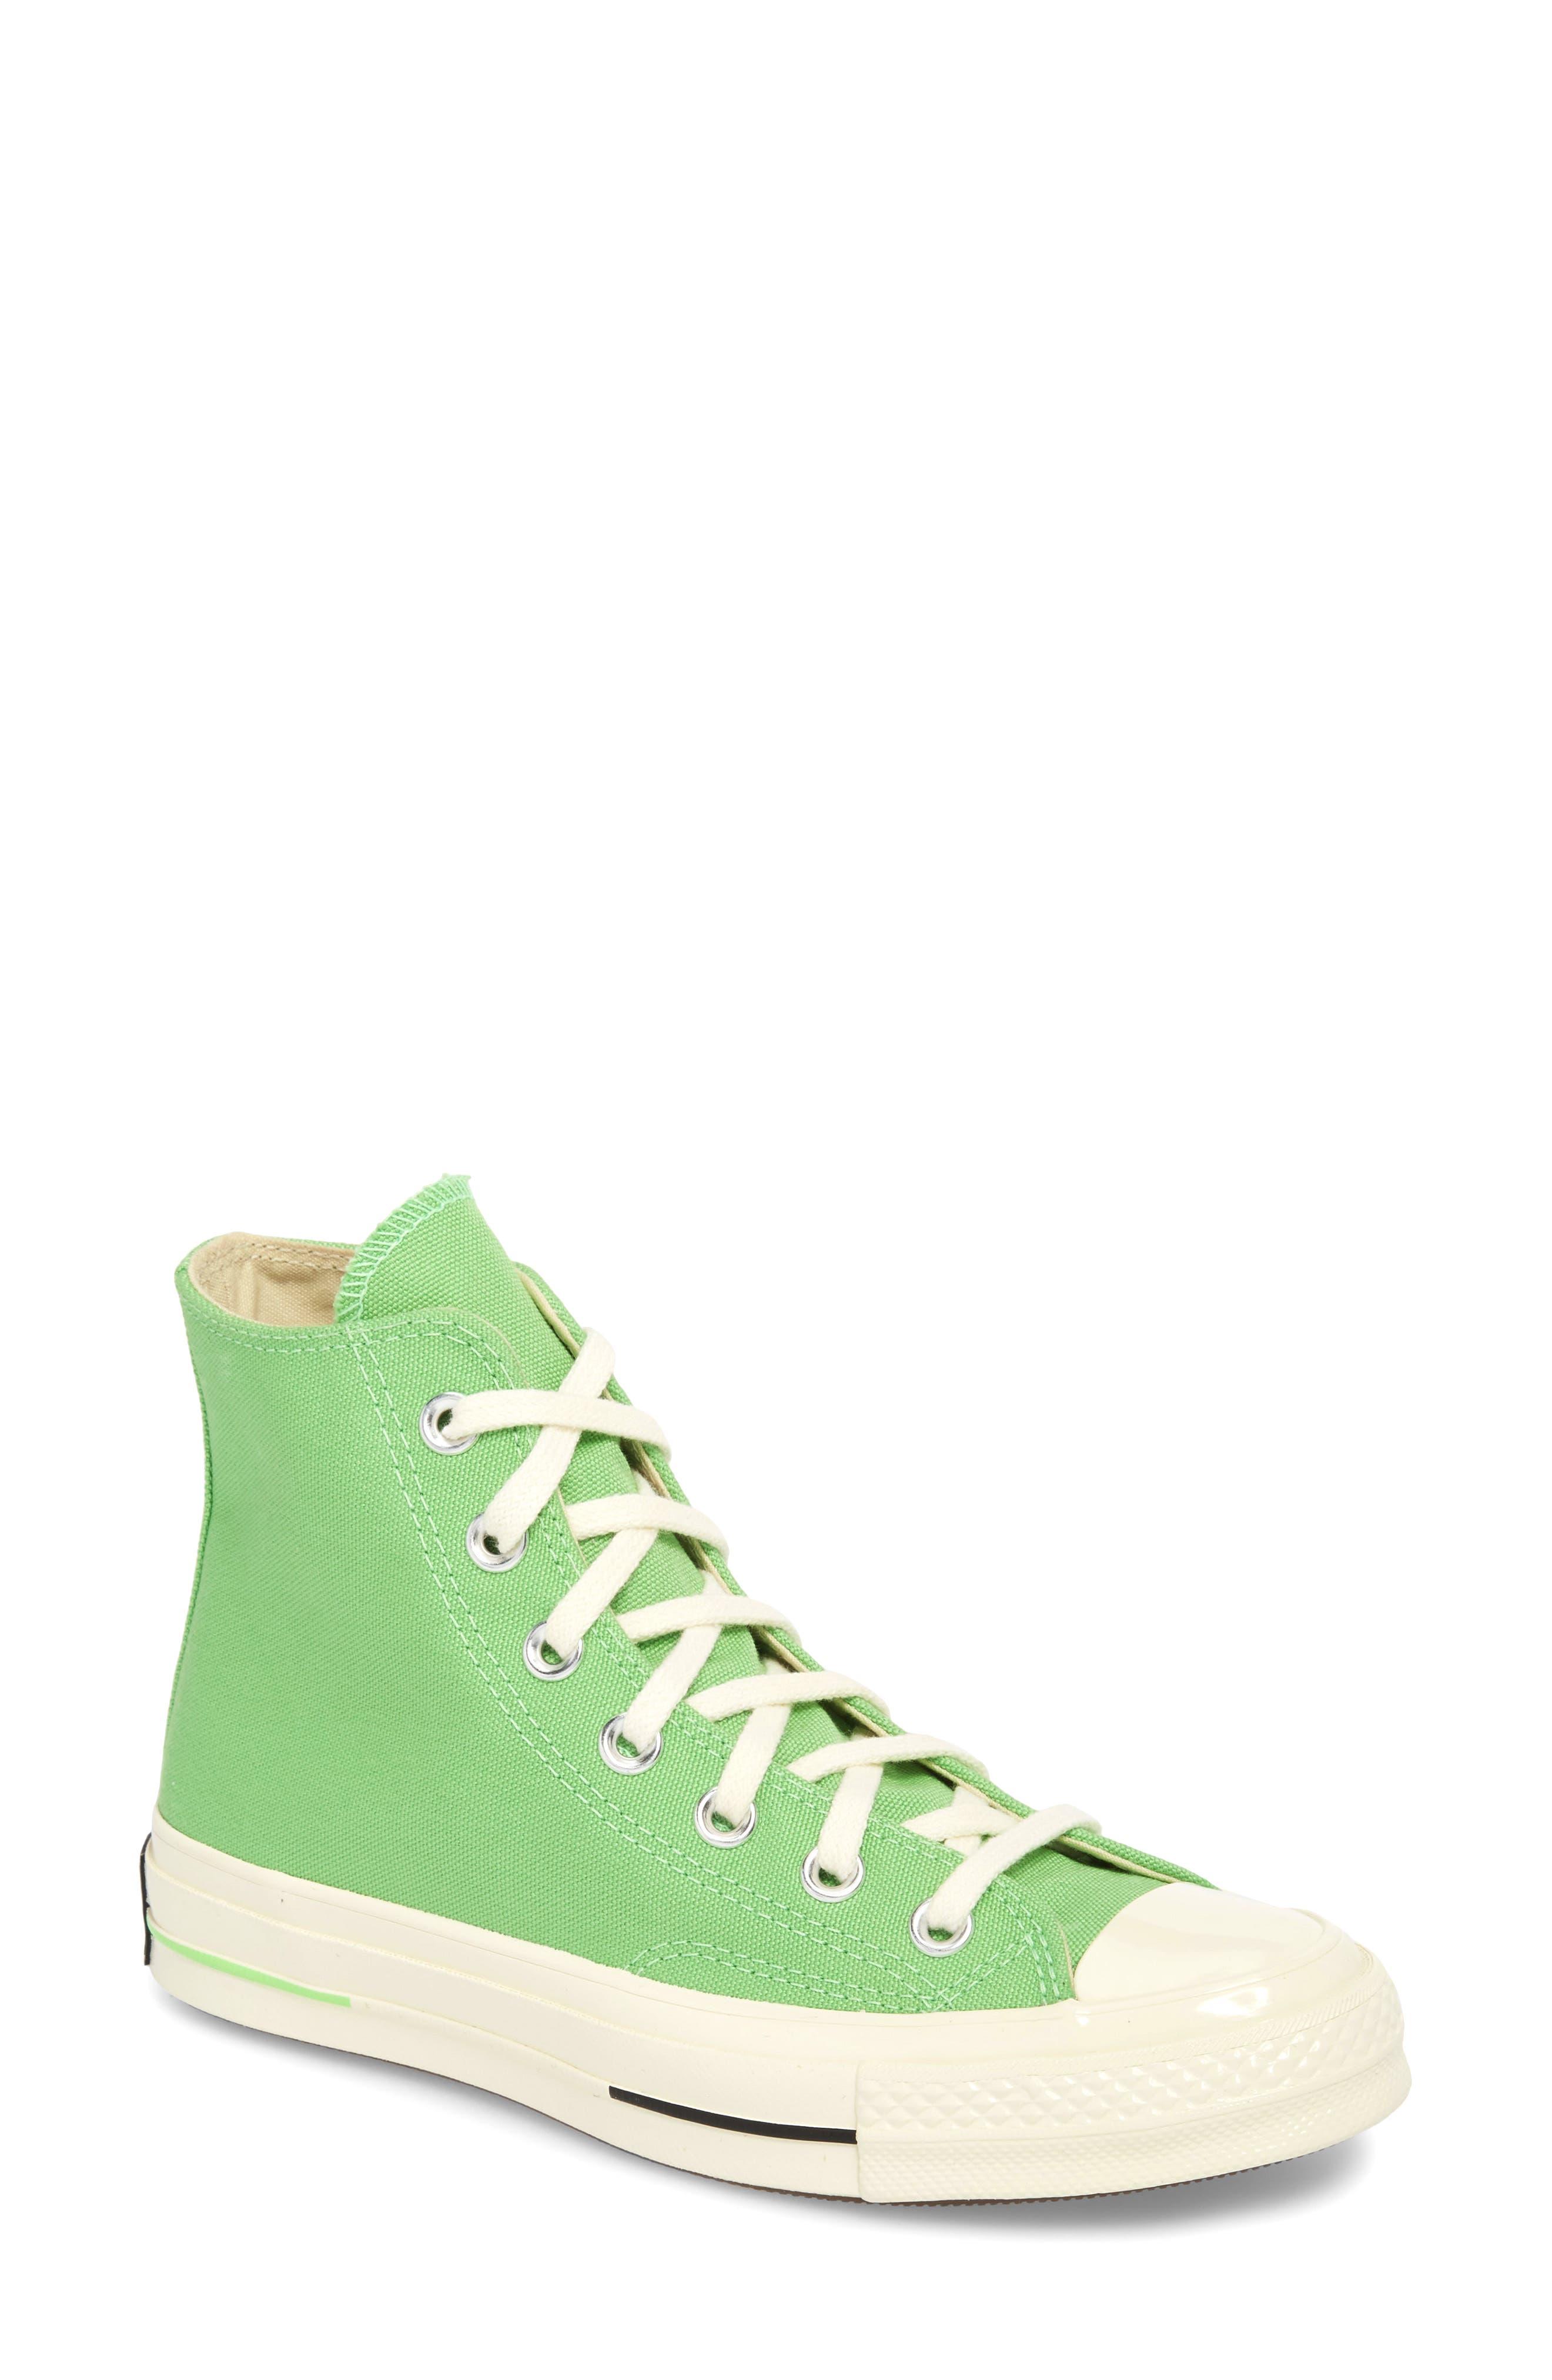 Converse Chuck Taylor® All Star® 70 Brights High Top Sneaker (Women)